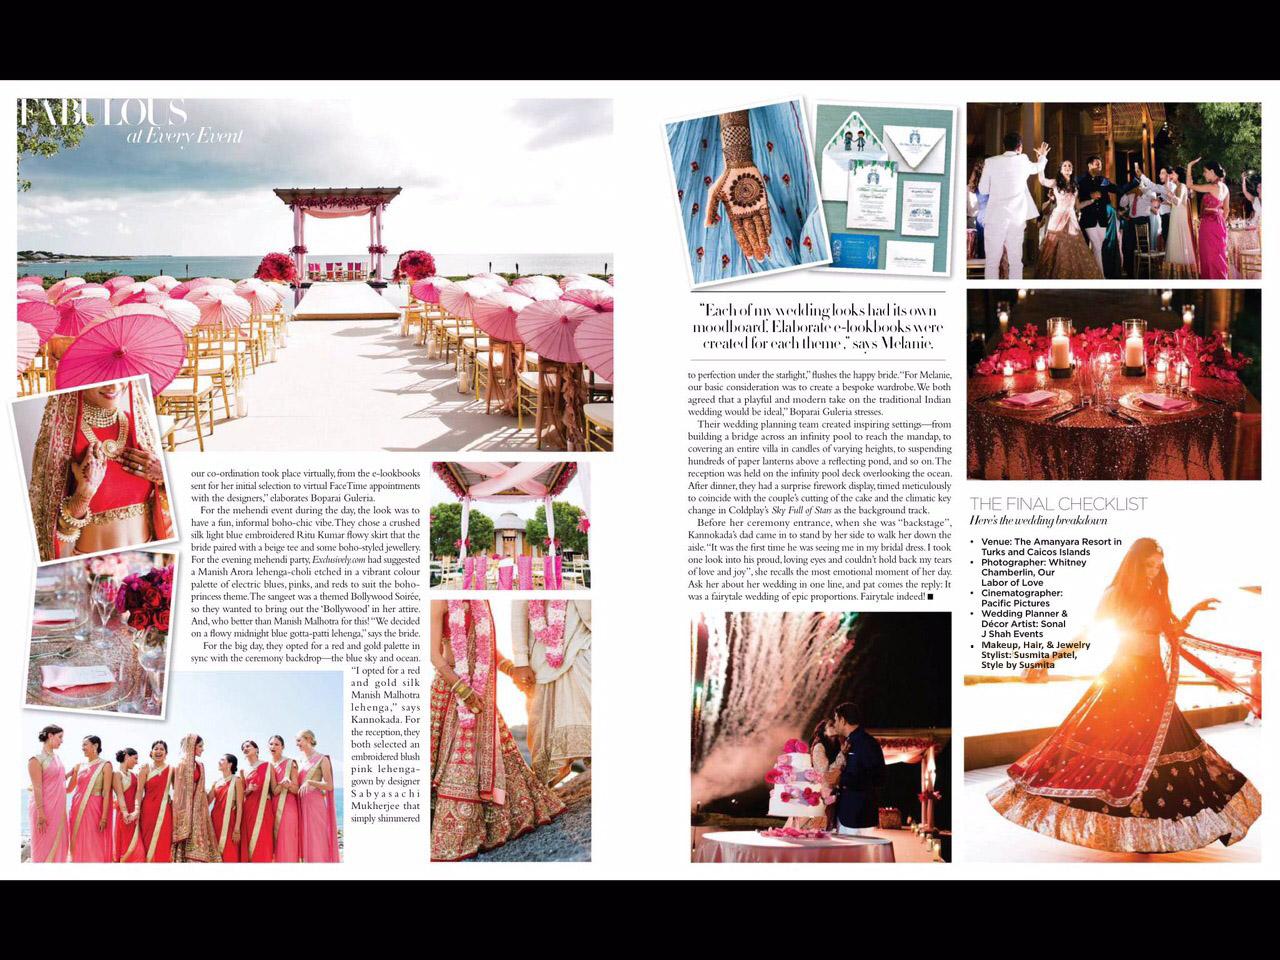 tags: Melanie Chandra wedding | Harpers Bazaar Bride | Melanie Kannokada Wedding | Manish Malhotra | Sabyasachi | Melanie Chandra wedding video